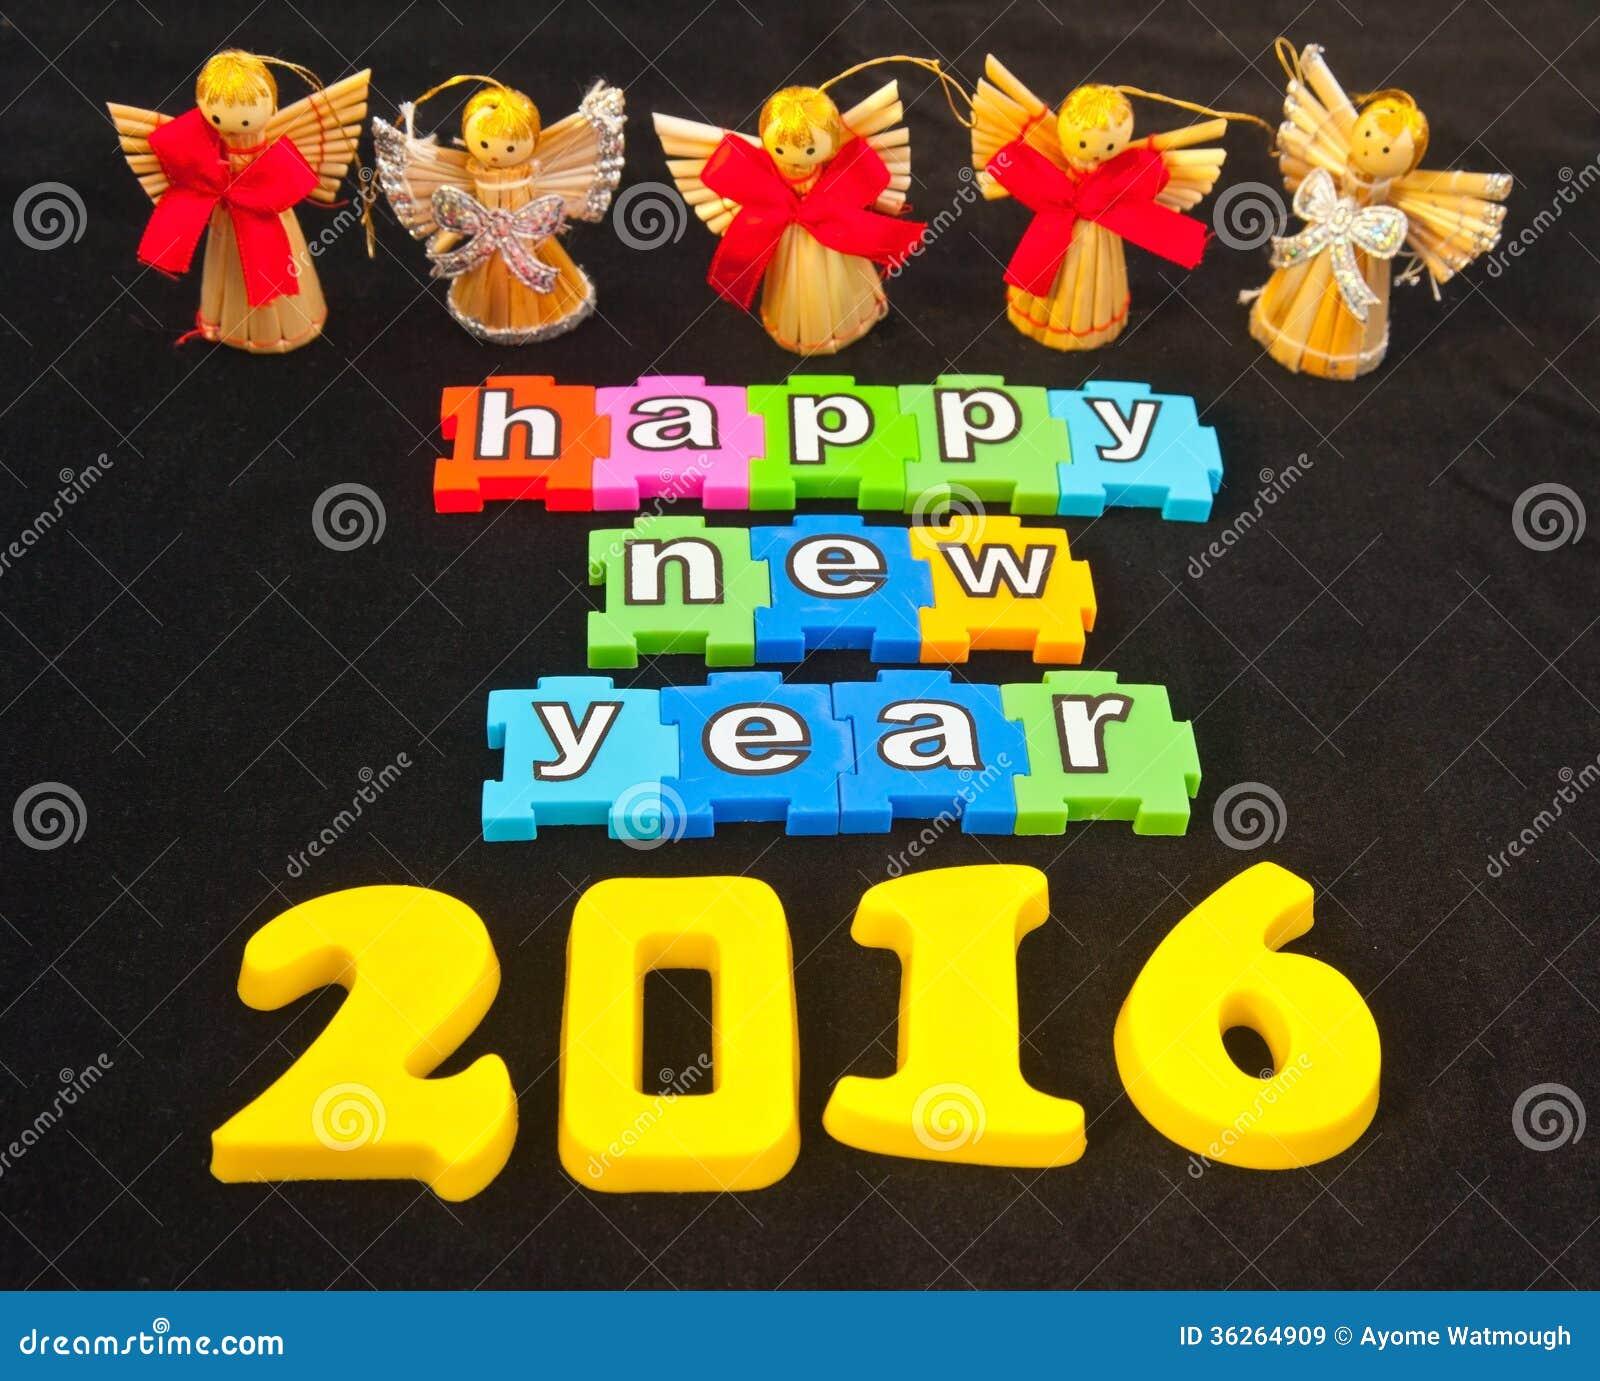 New year 2016 stock photo image 58693644 - Inne Zdj Cia Stock Na Temat Nowy Rok 2016